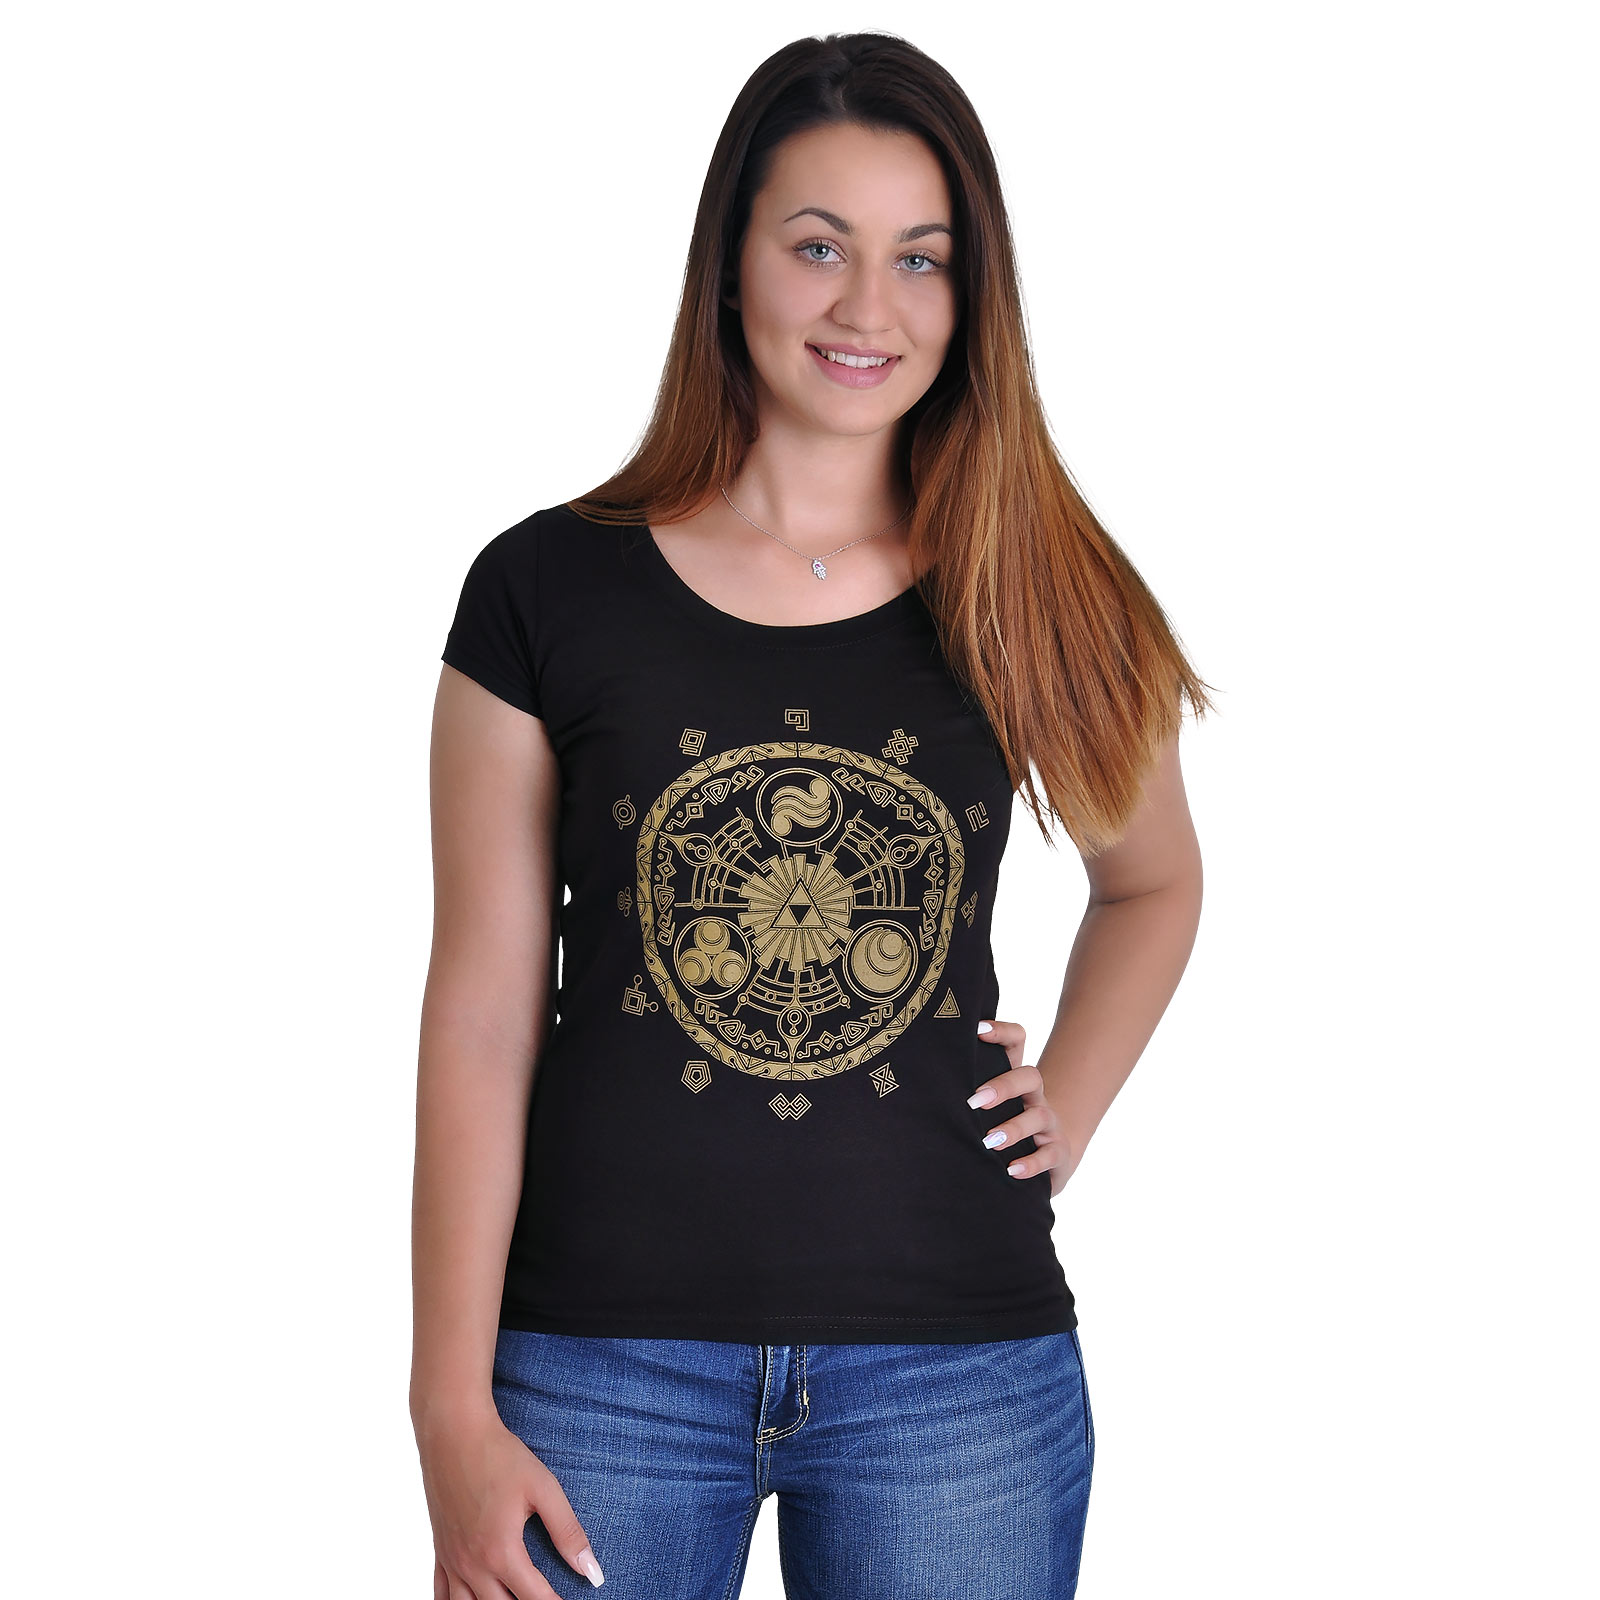 Zelda - Triforce Girlie Shirt